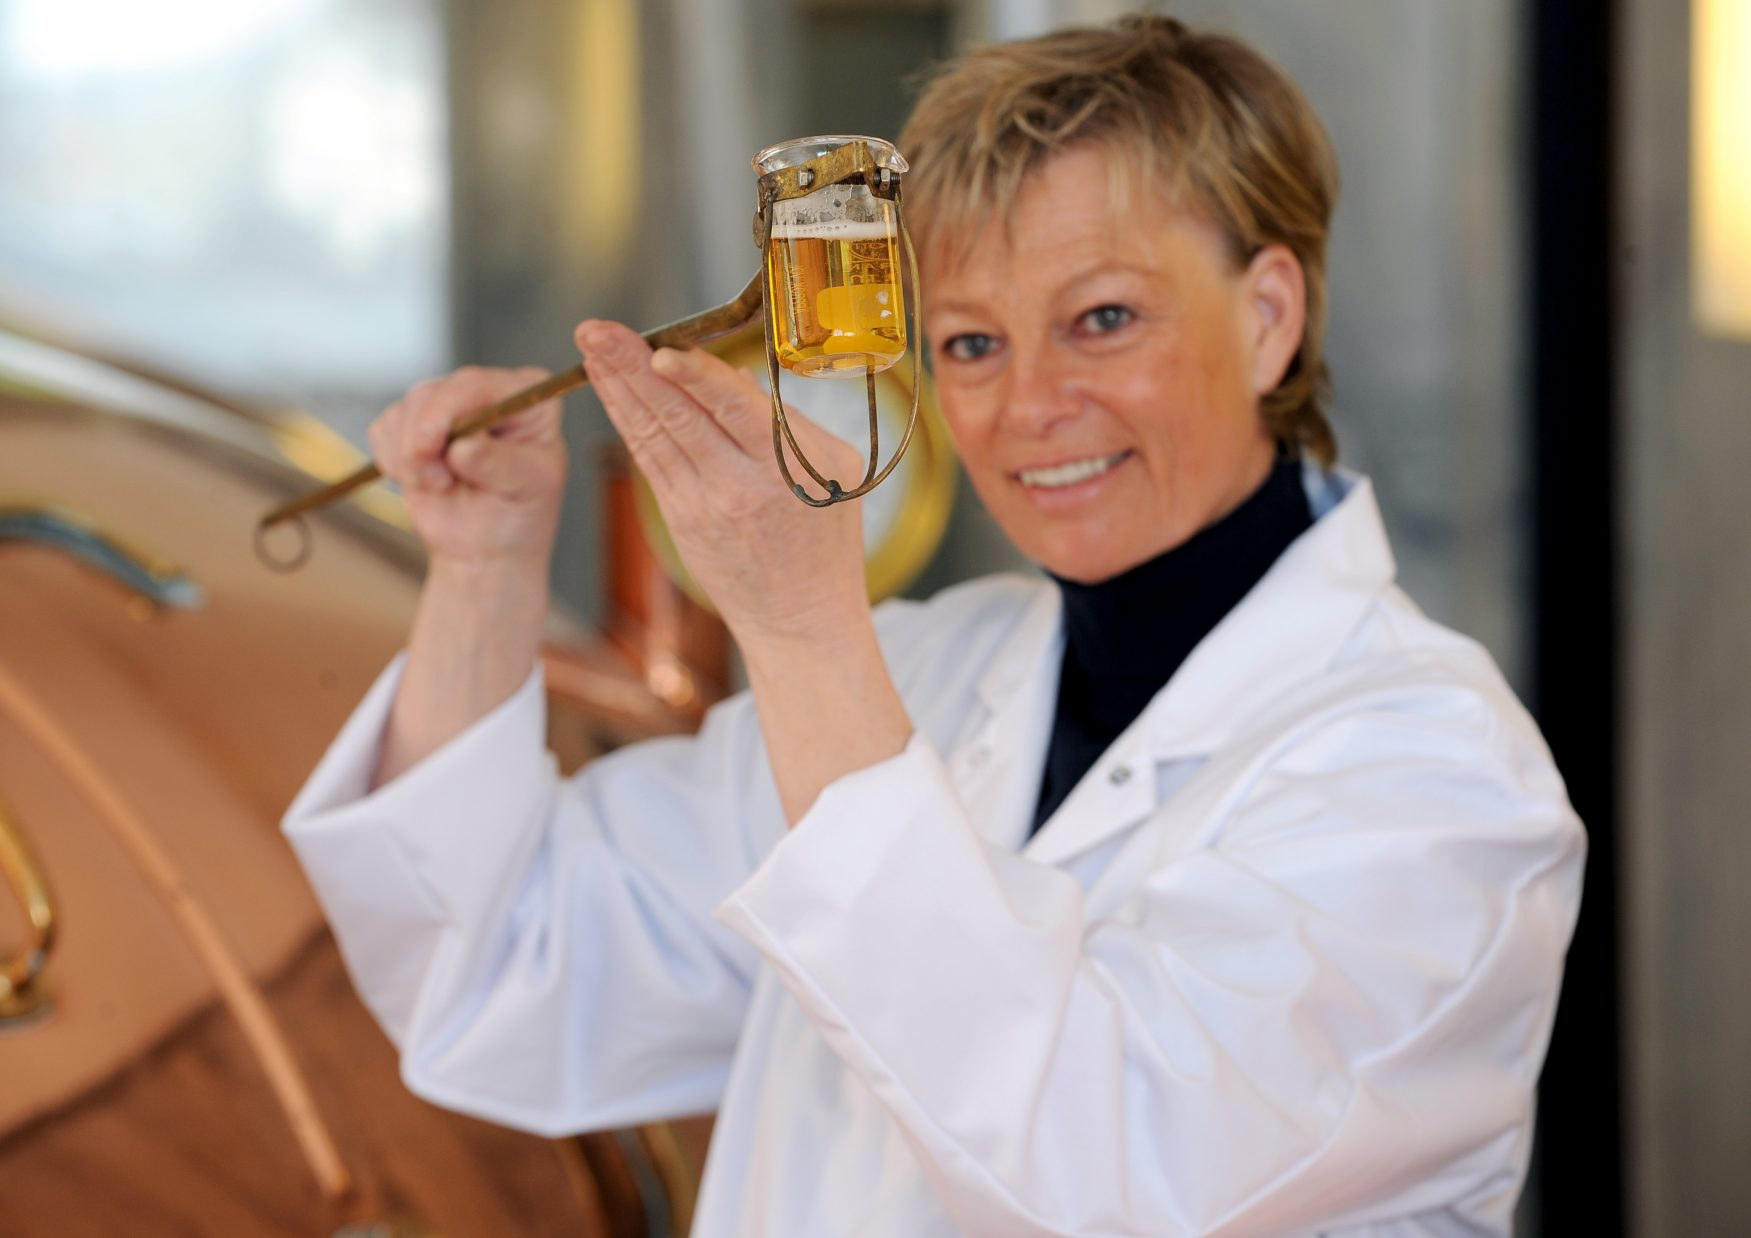 Braumeisterin Friederike Strate im Sudhaus, Foto: Brauerei Strate